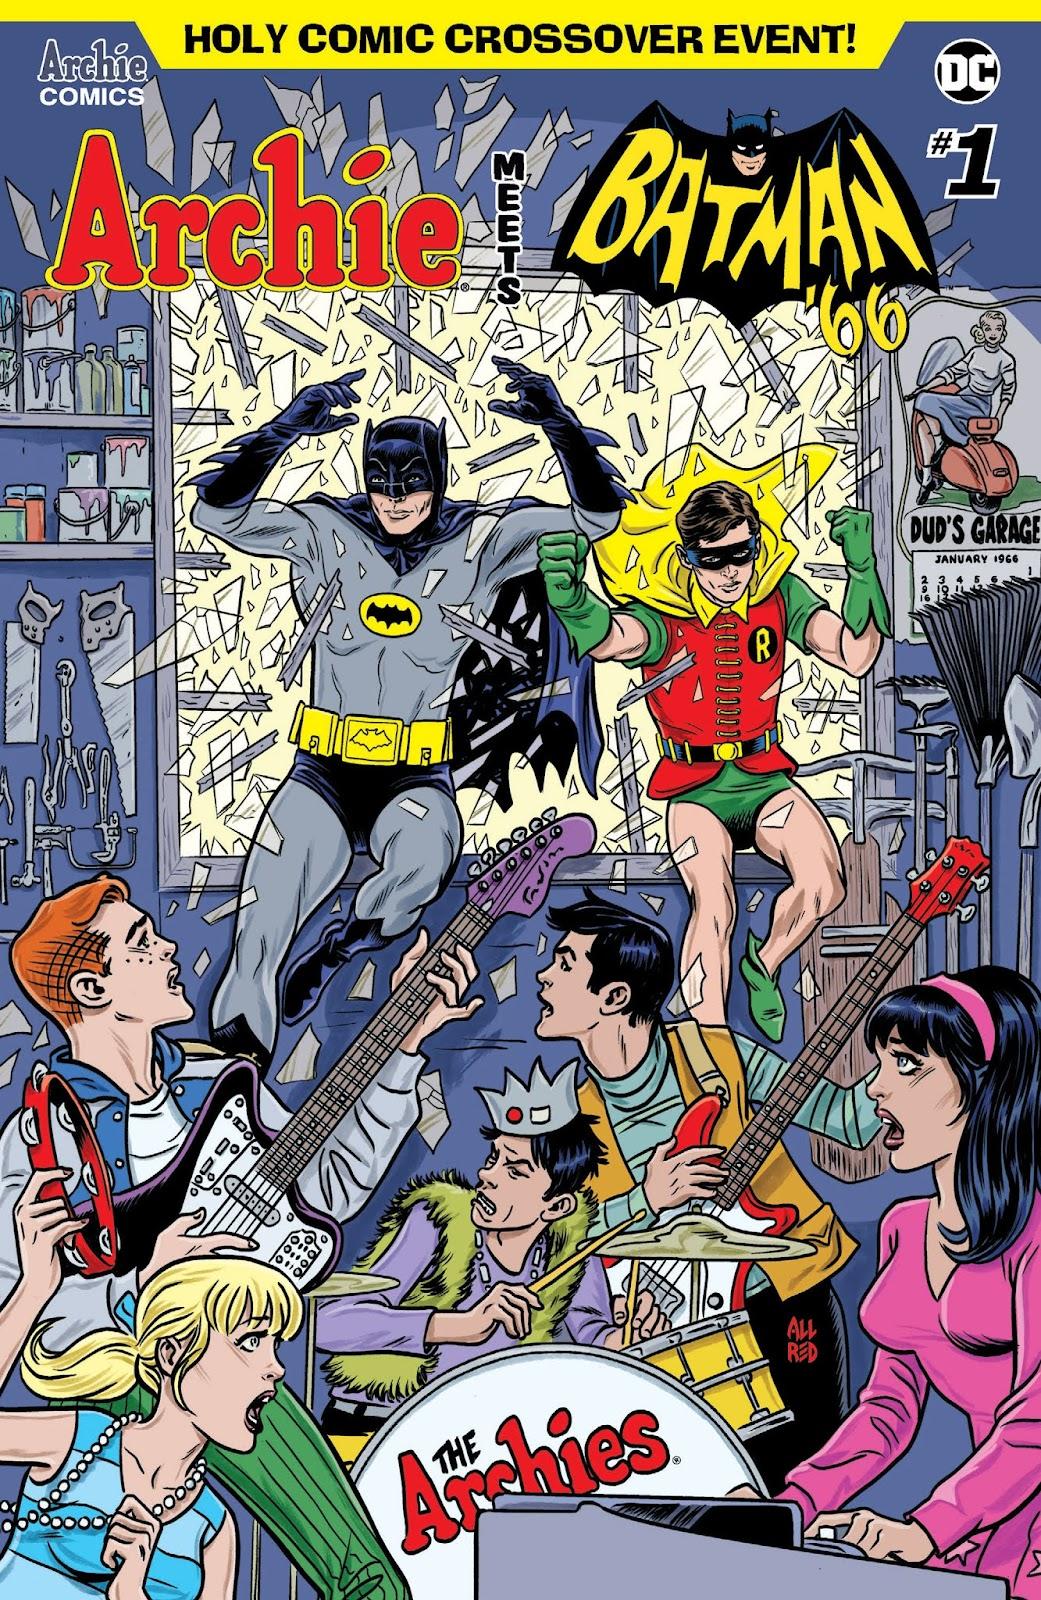 Archie Meets Batman '66 issue 1 - Page 1